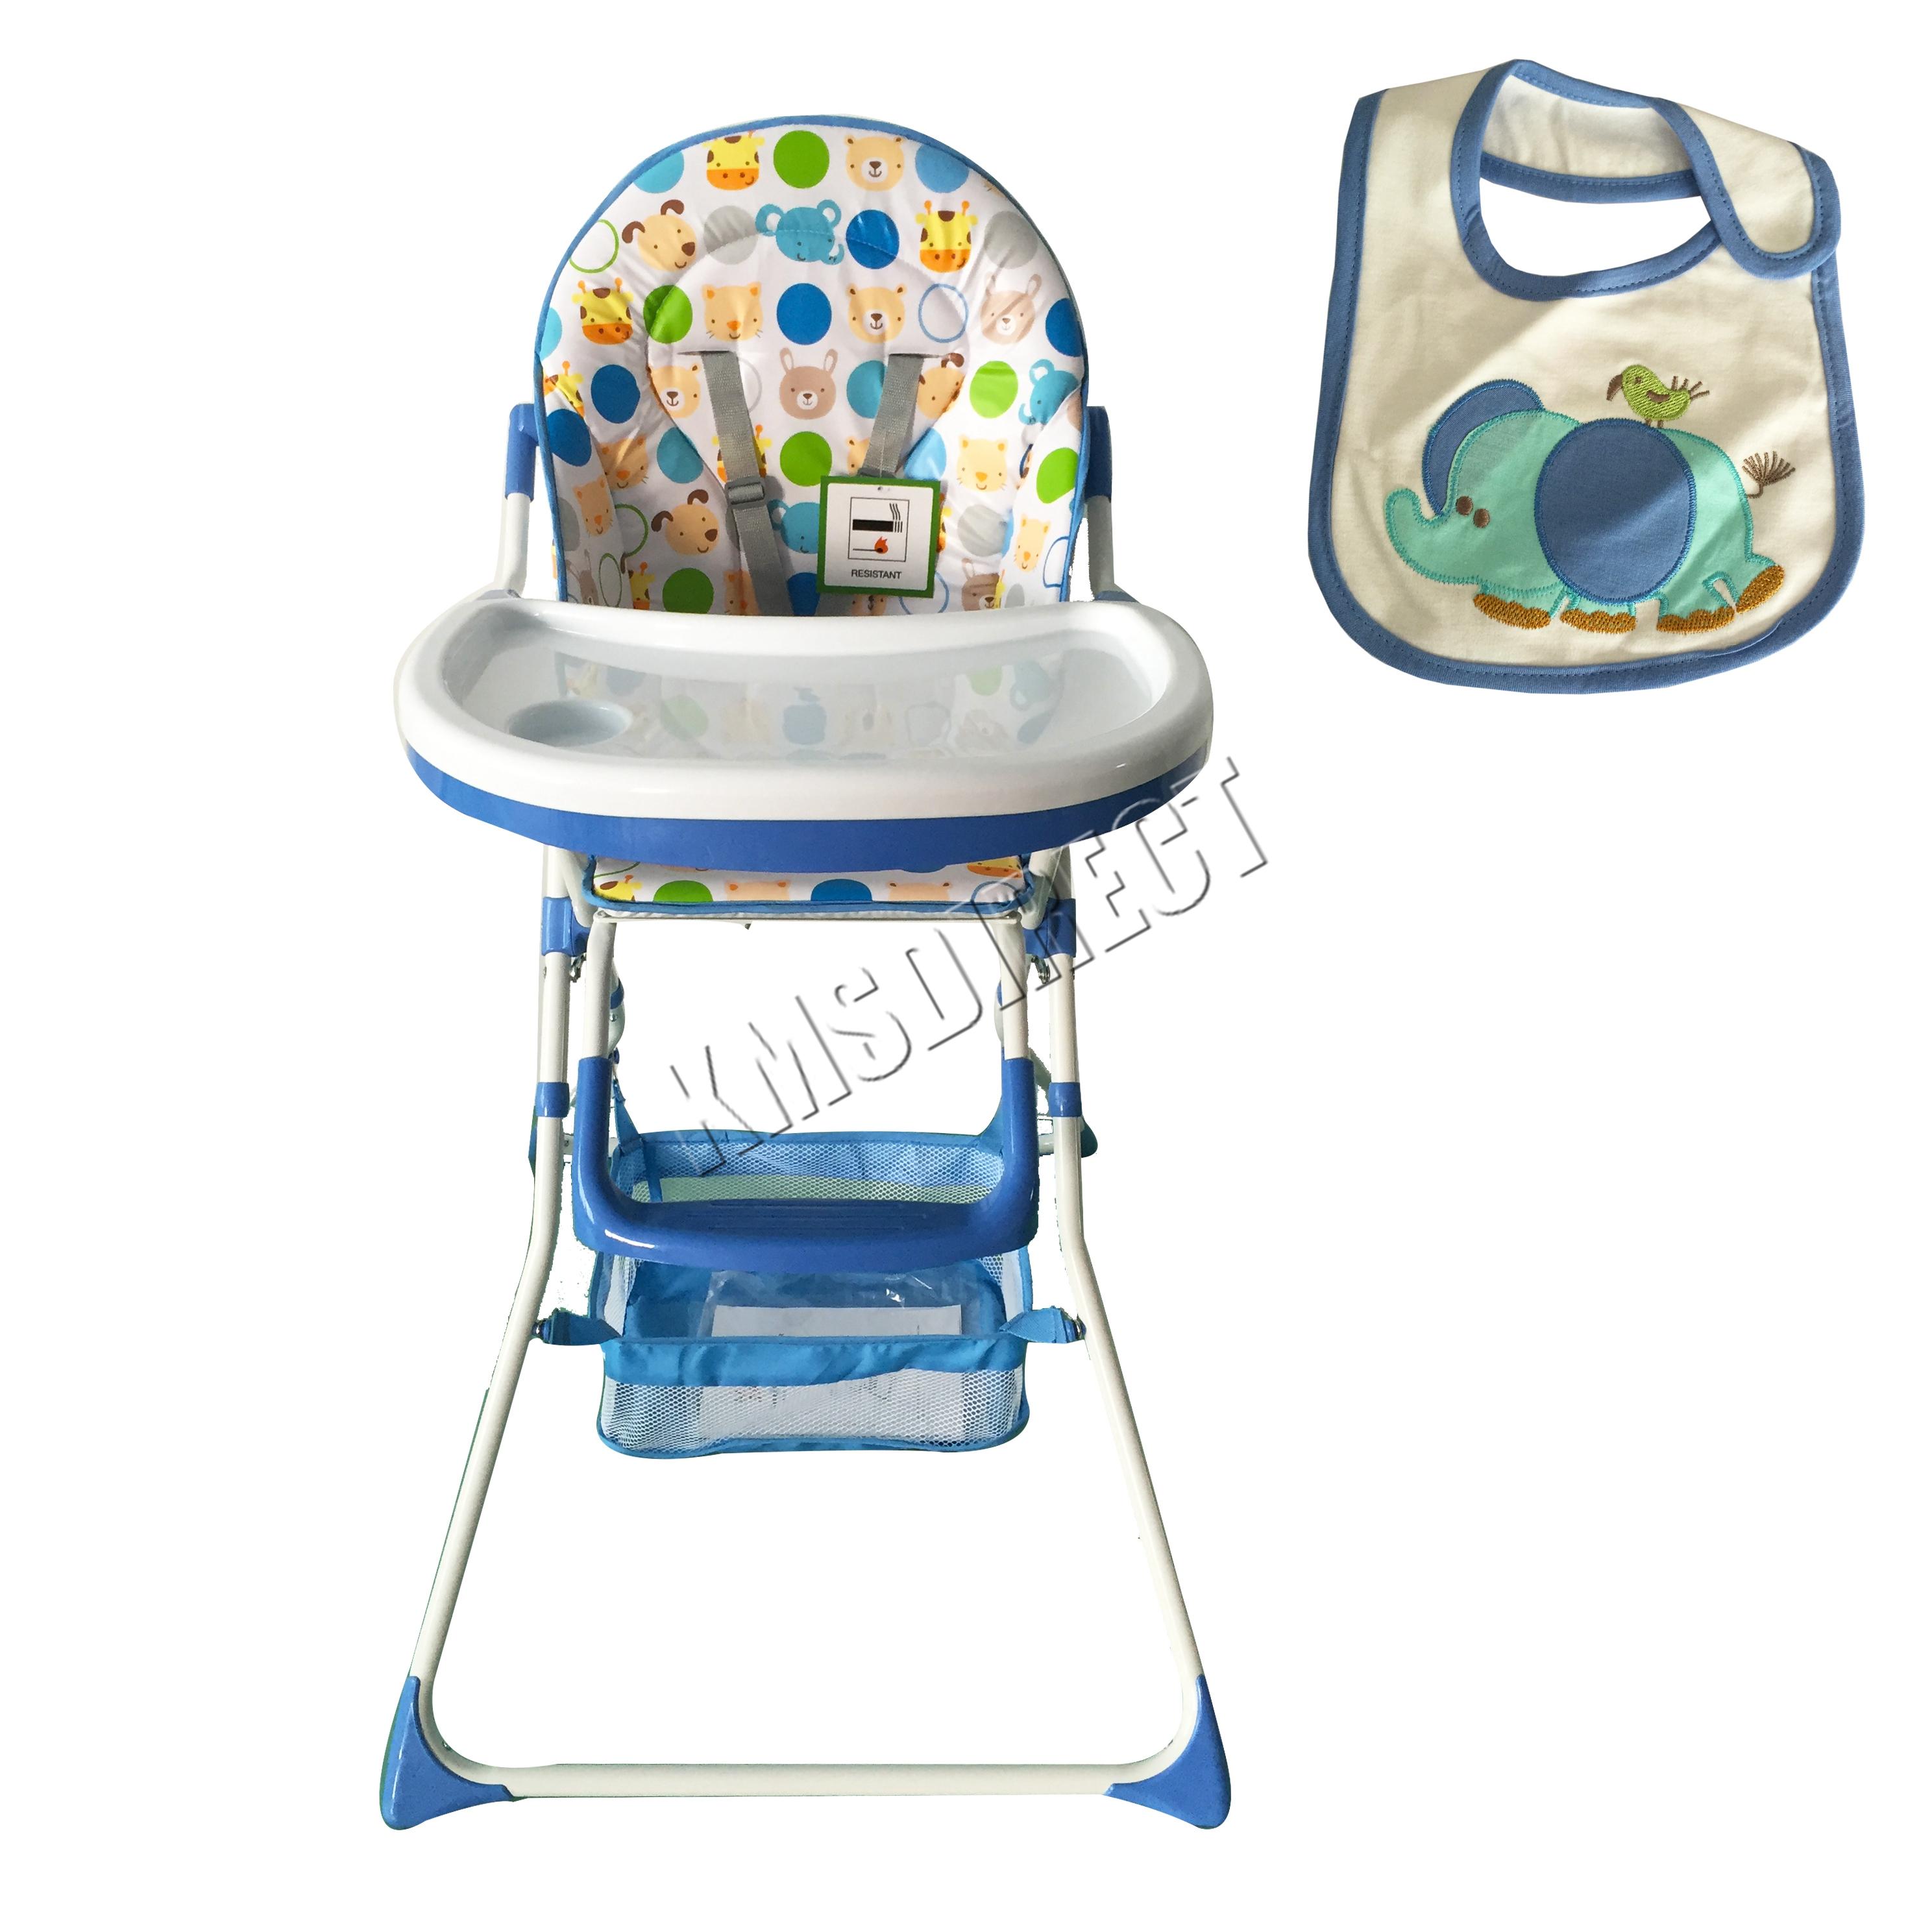 portable baby chair walmart parson chairs foxhunter high infant child folding